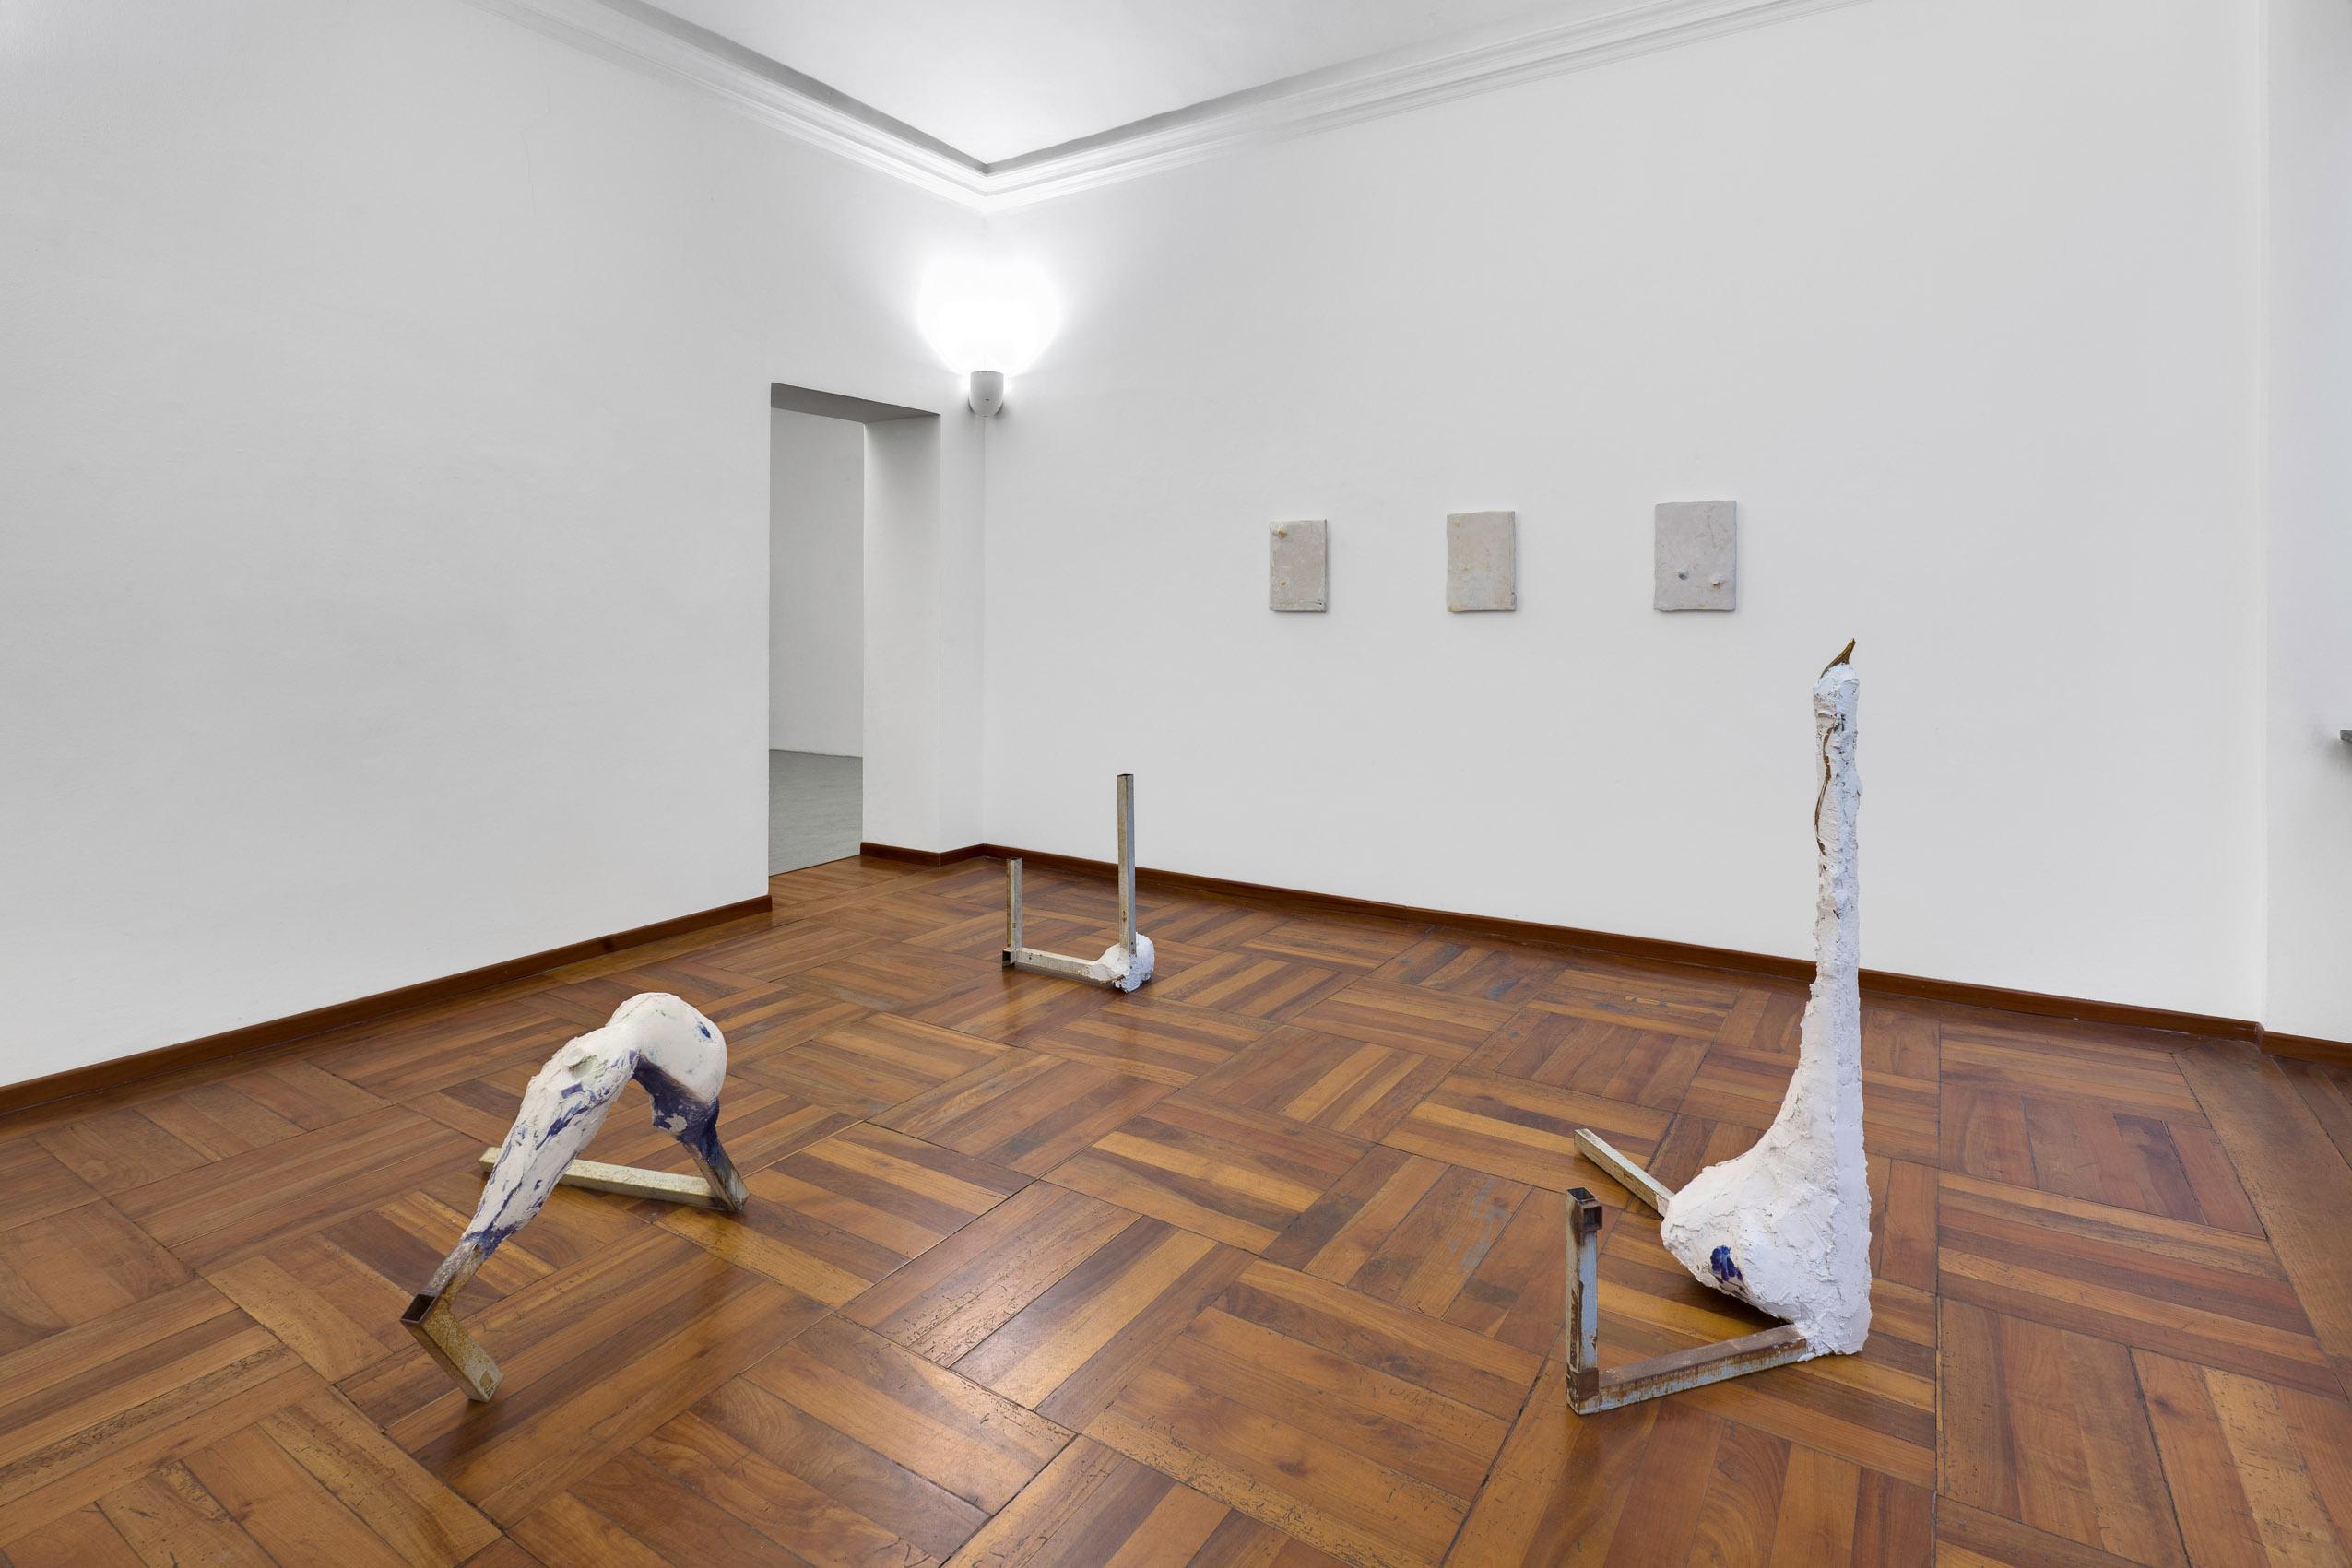 Francesca-Ferreri-Cluster-Clutter-installation-view-3